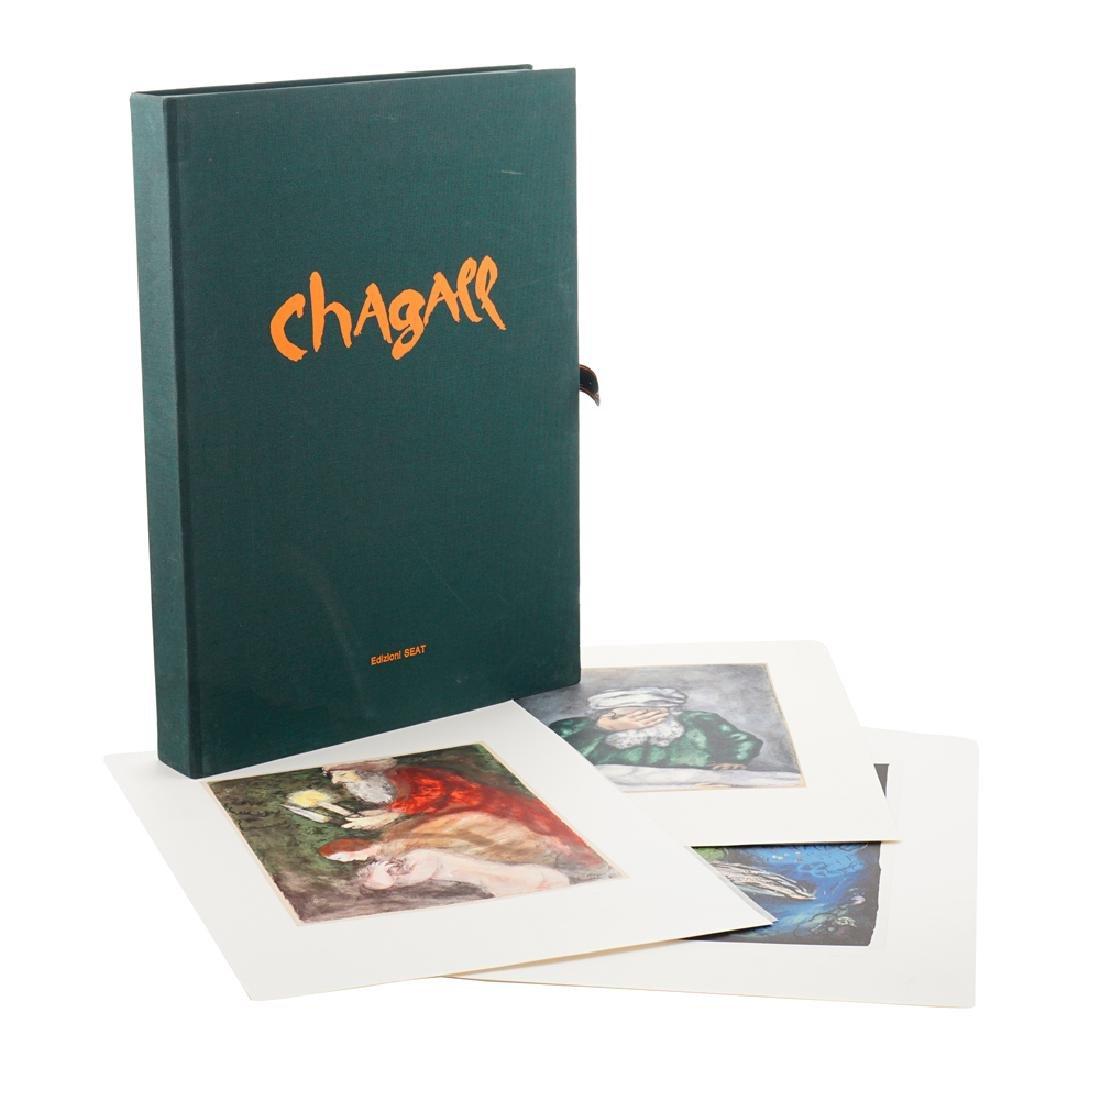 Chagall Folder Turin 1986 55x40x6 cm.